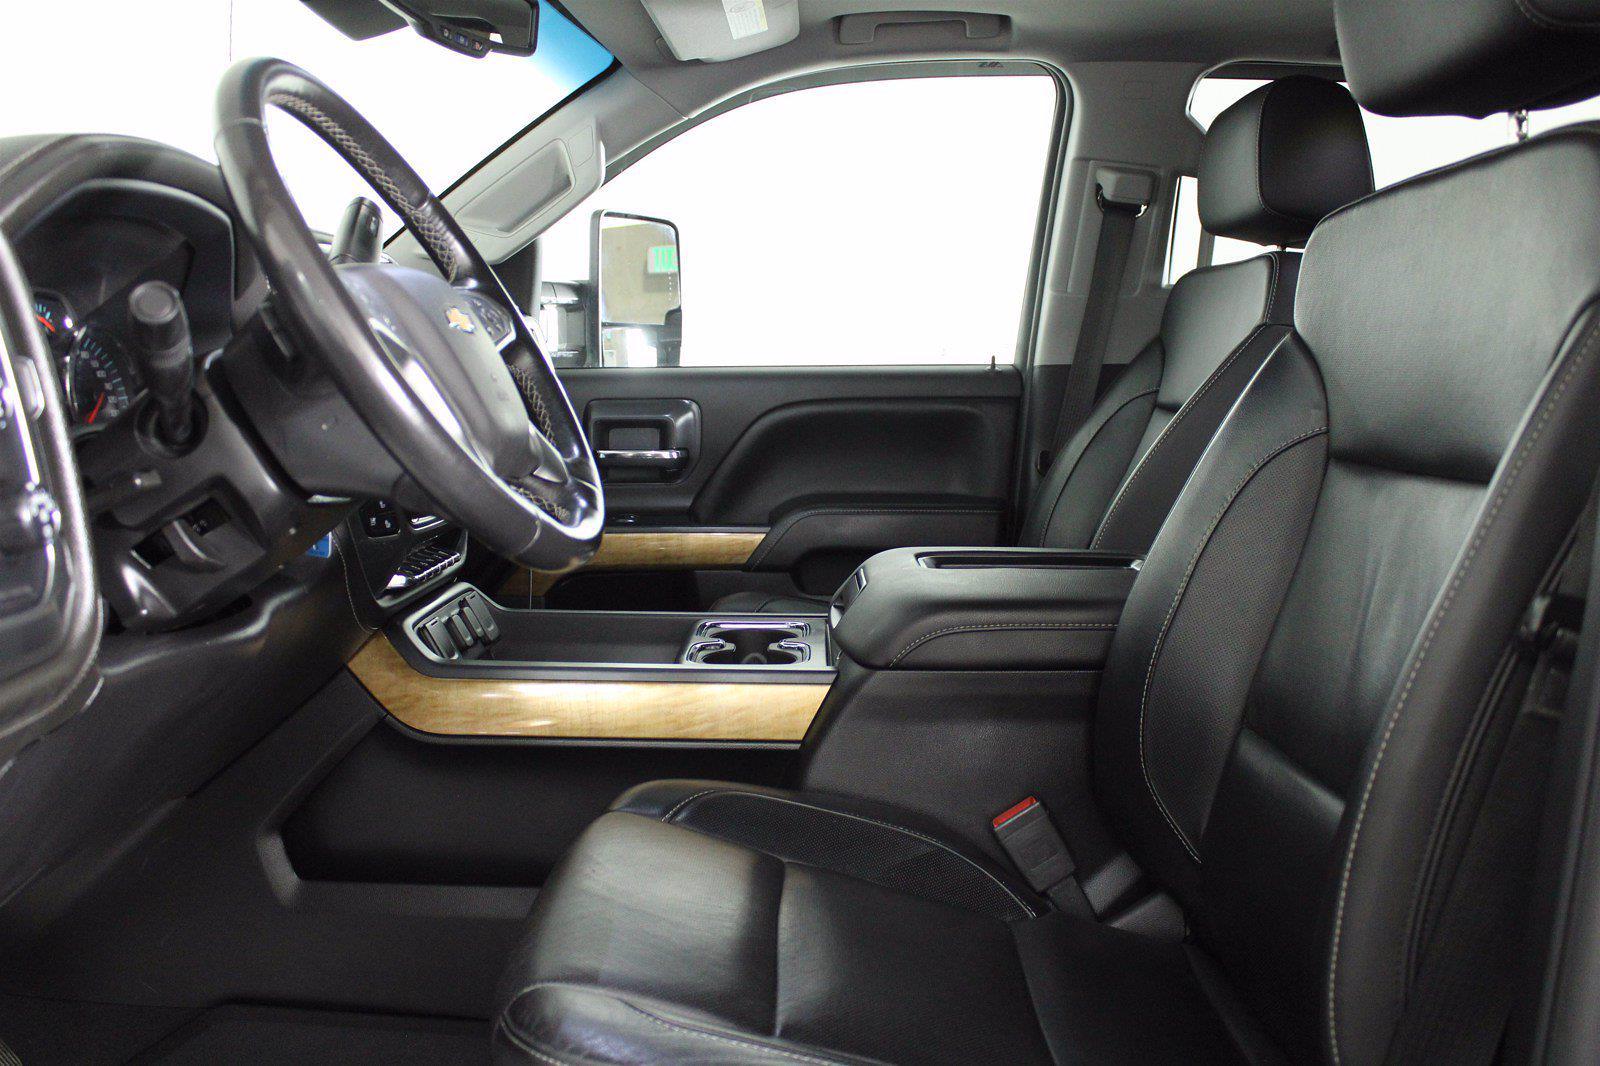 2019 Chevrolet Silverado 2500 Crew Cab 4x4, Pickup #D110643A - photo 15